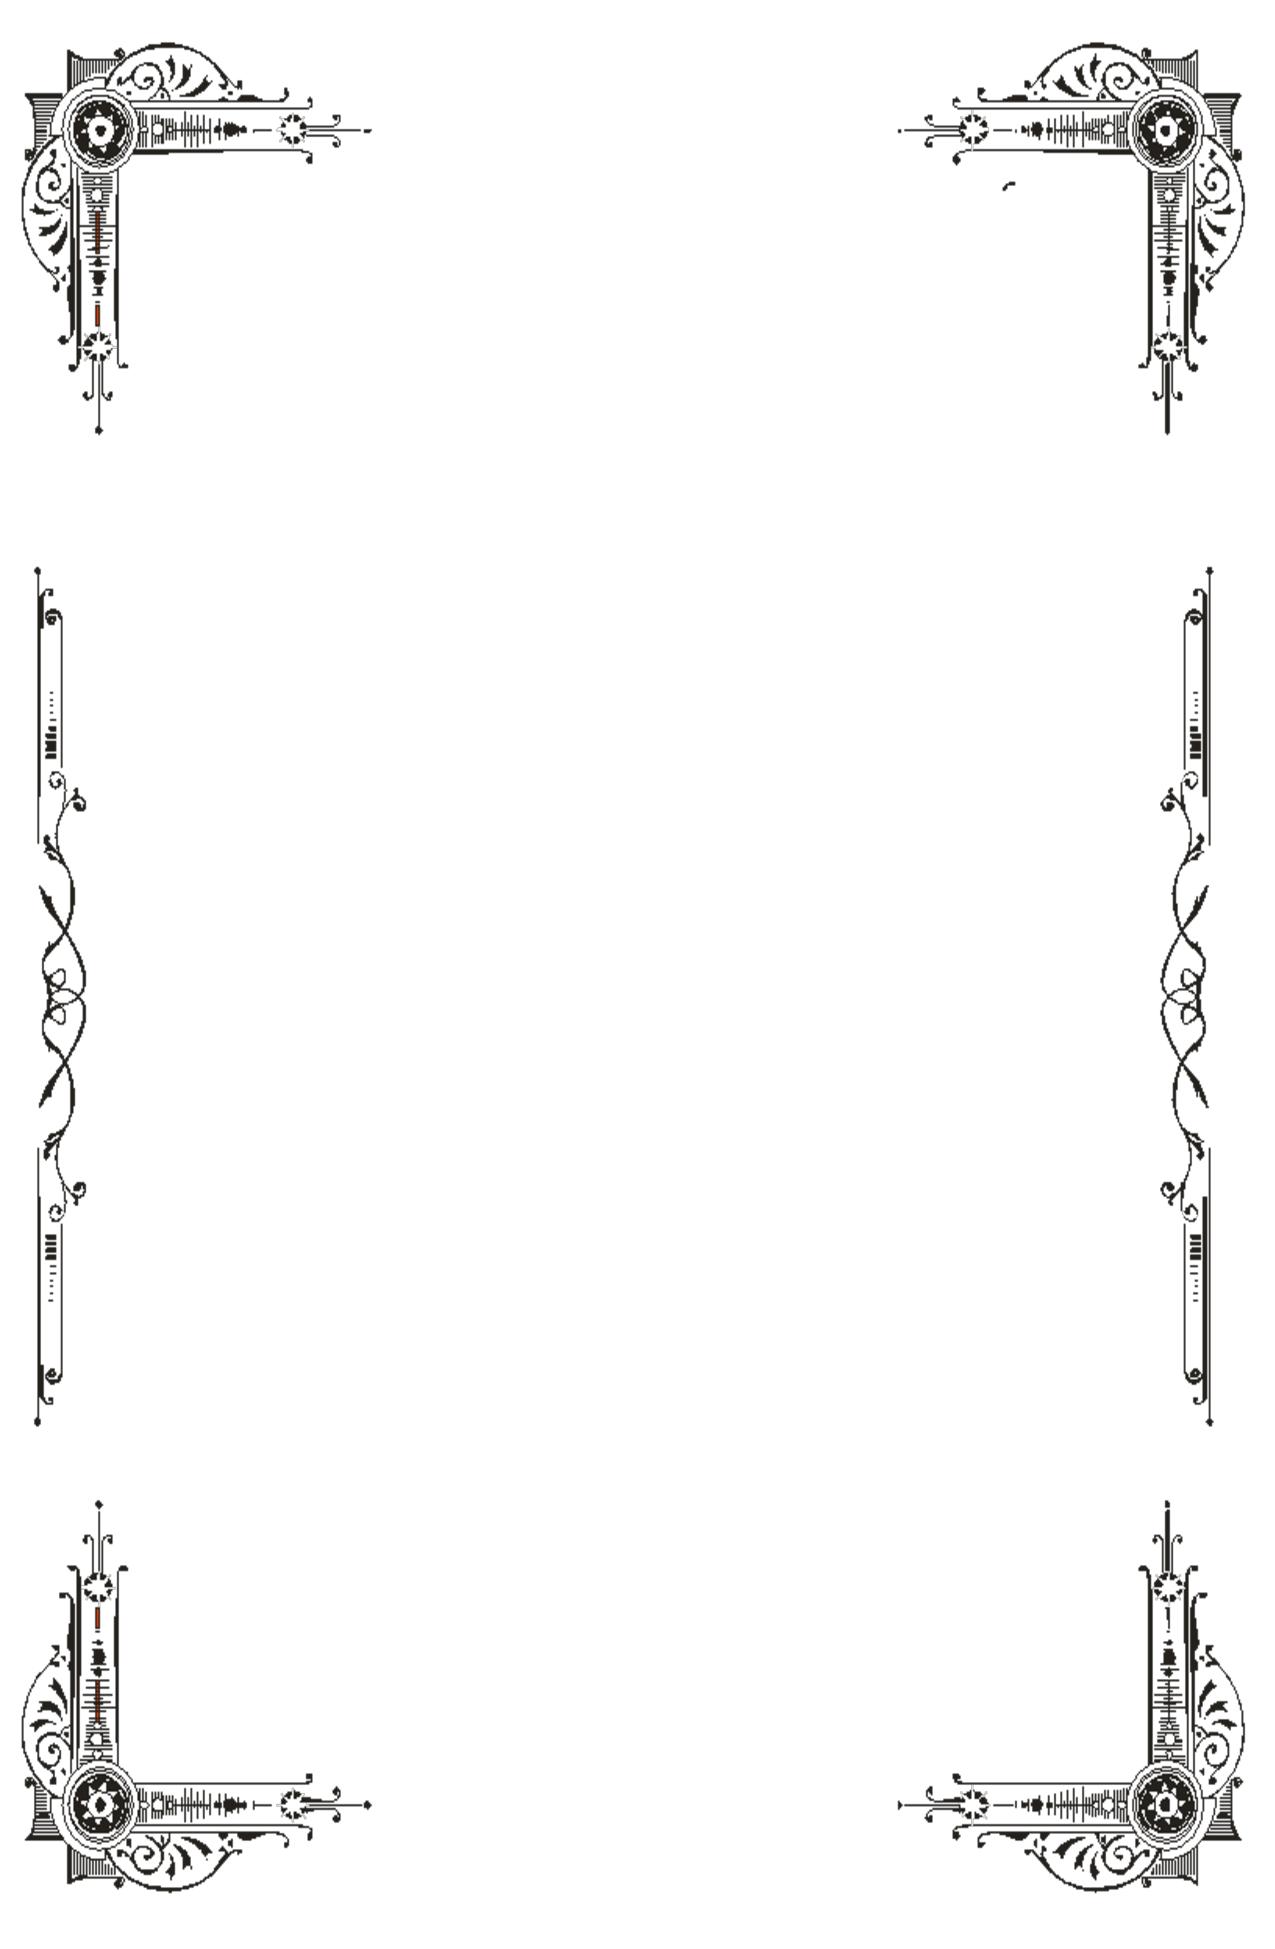 Half Sheet Borders